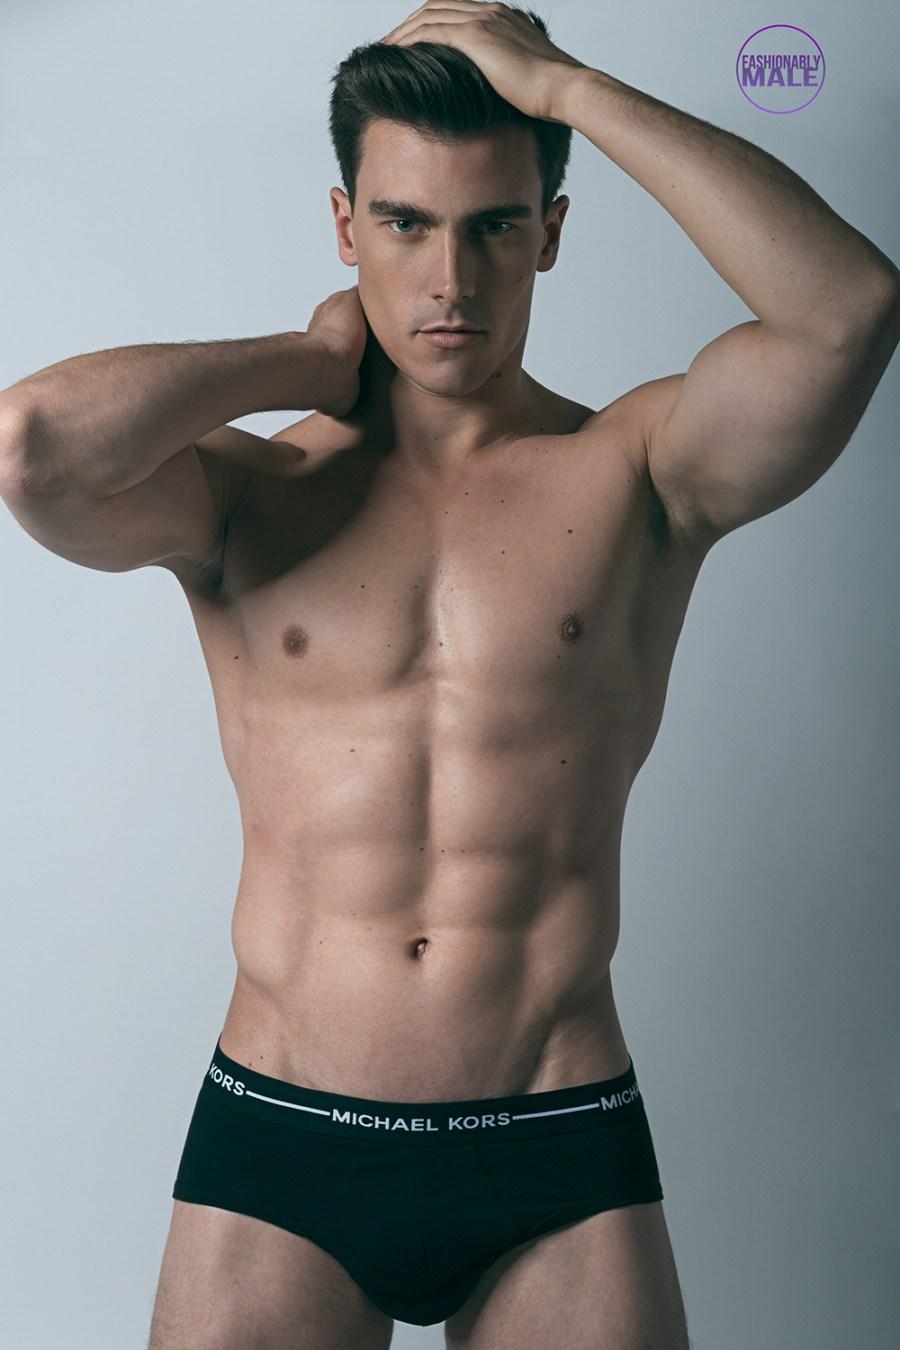 Tomas by Jo Herrera for Fashionably Male9